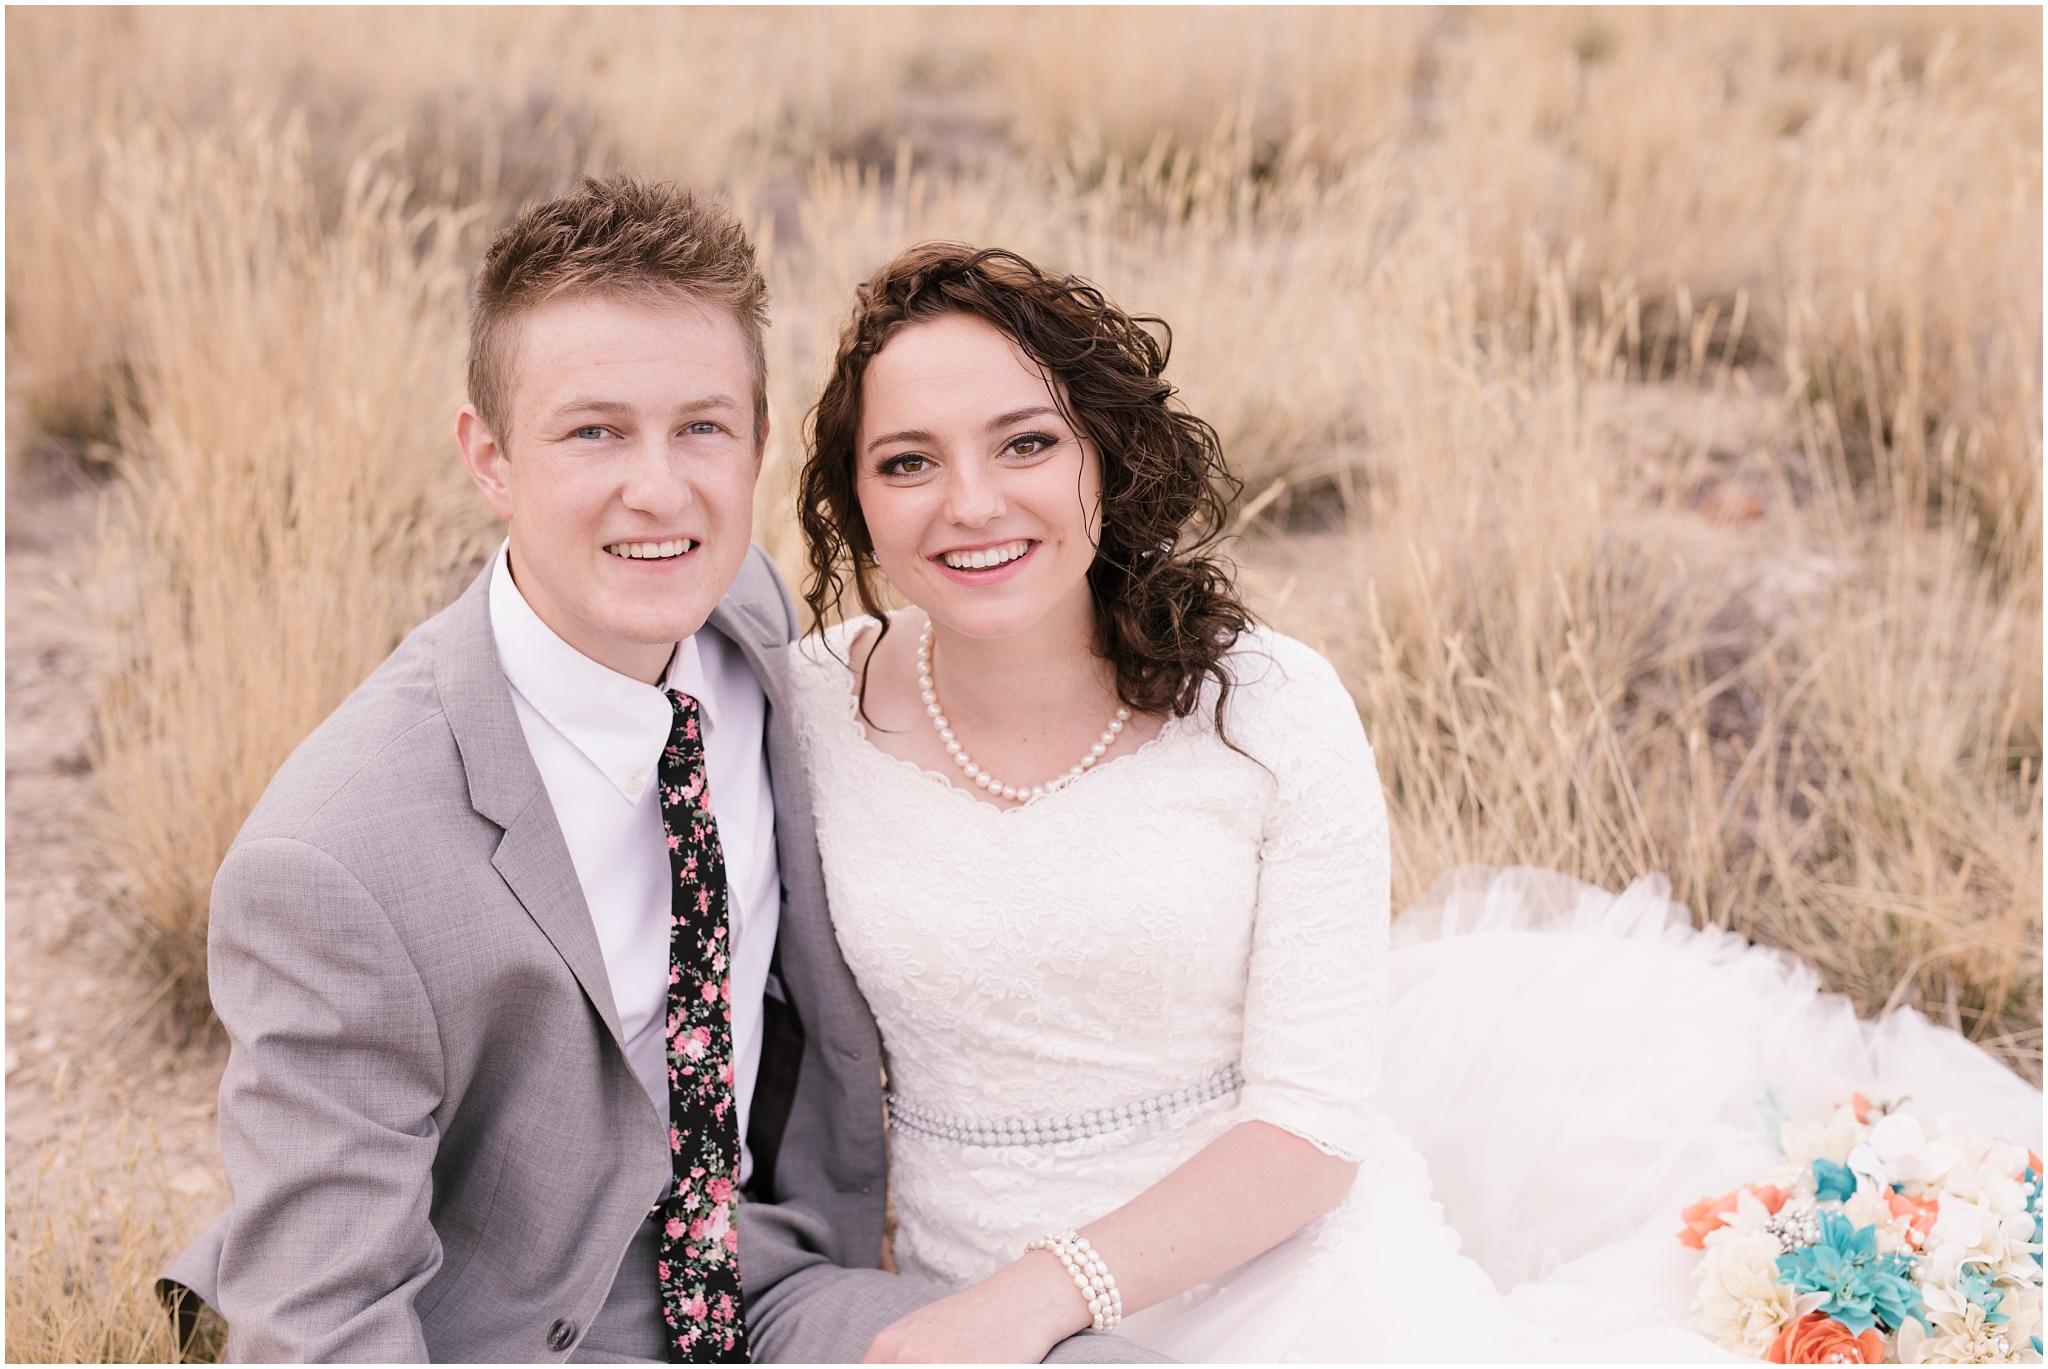 BA-Bridals-169_Lizzie-B-Imagery-Utah-Wedding-Photographer-Central-Utah-Photographer-Utah-County-Manti-Utah-Temple.jpg